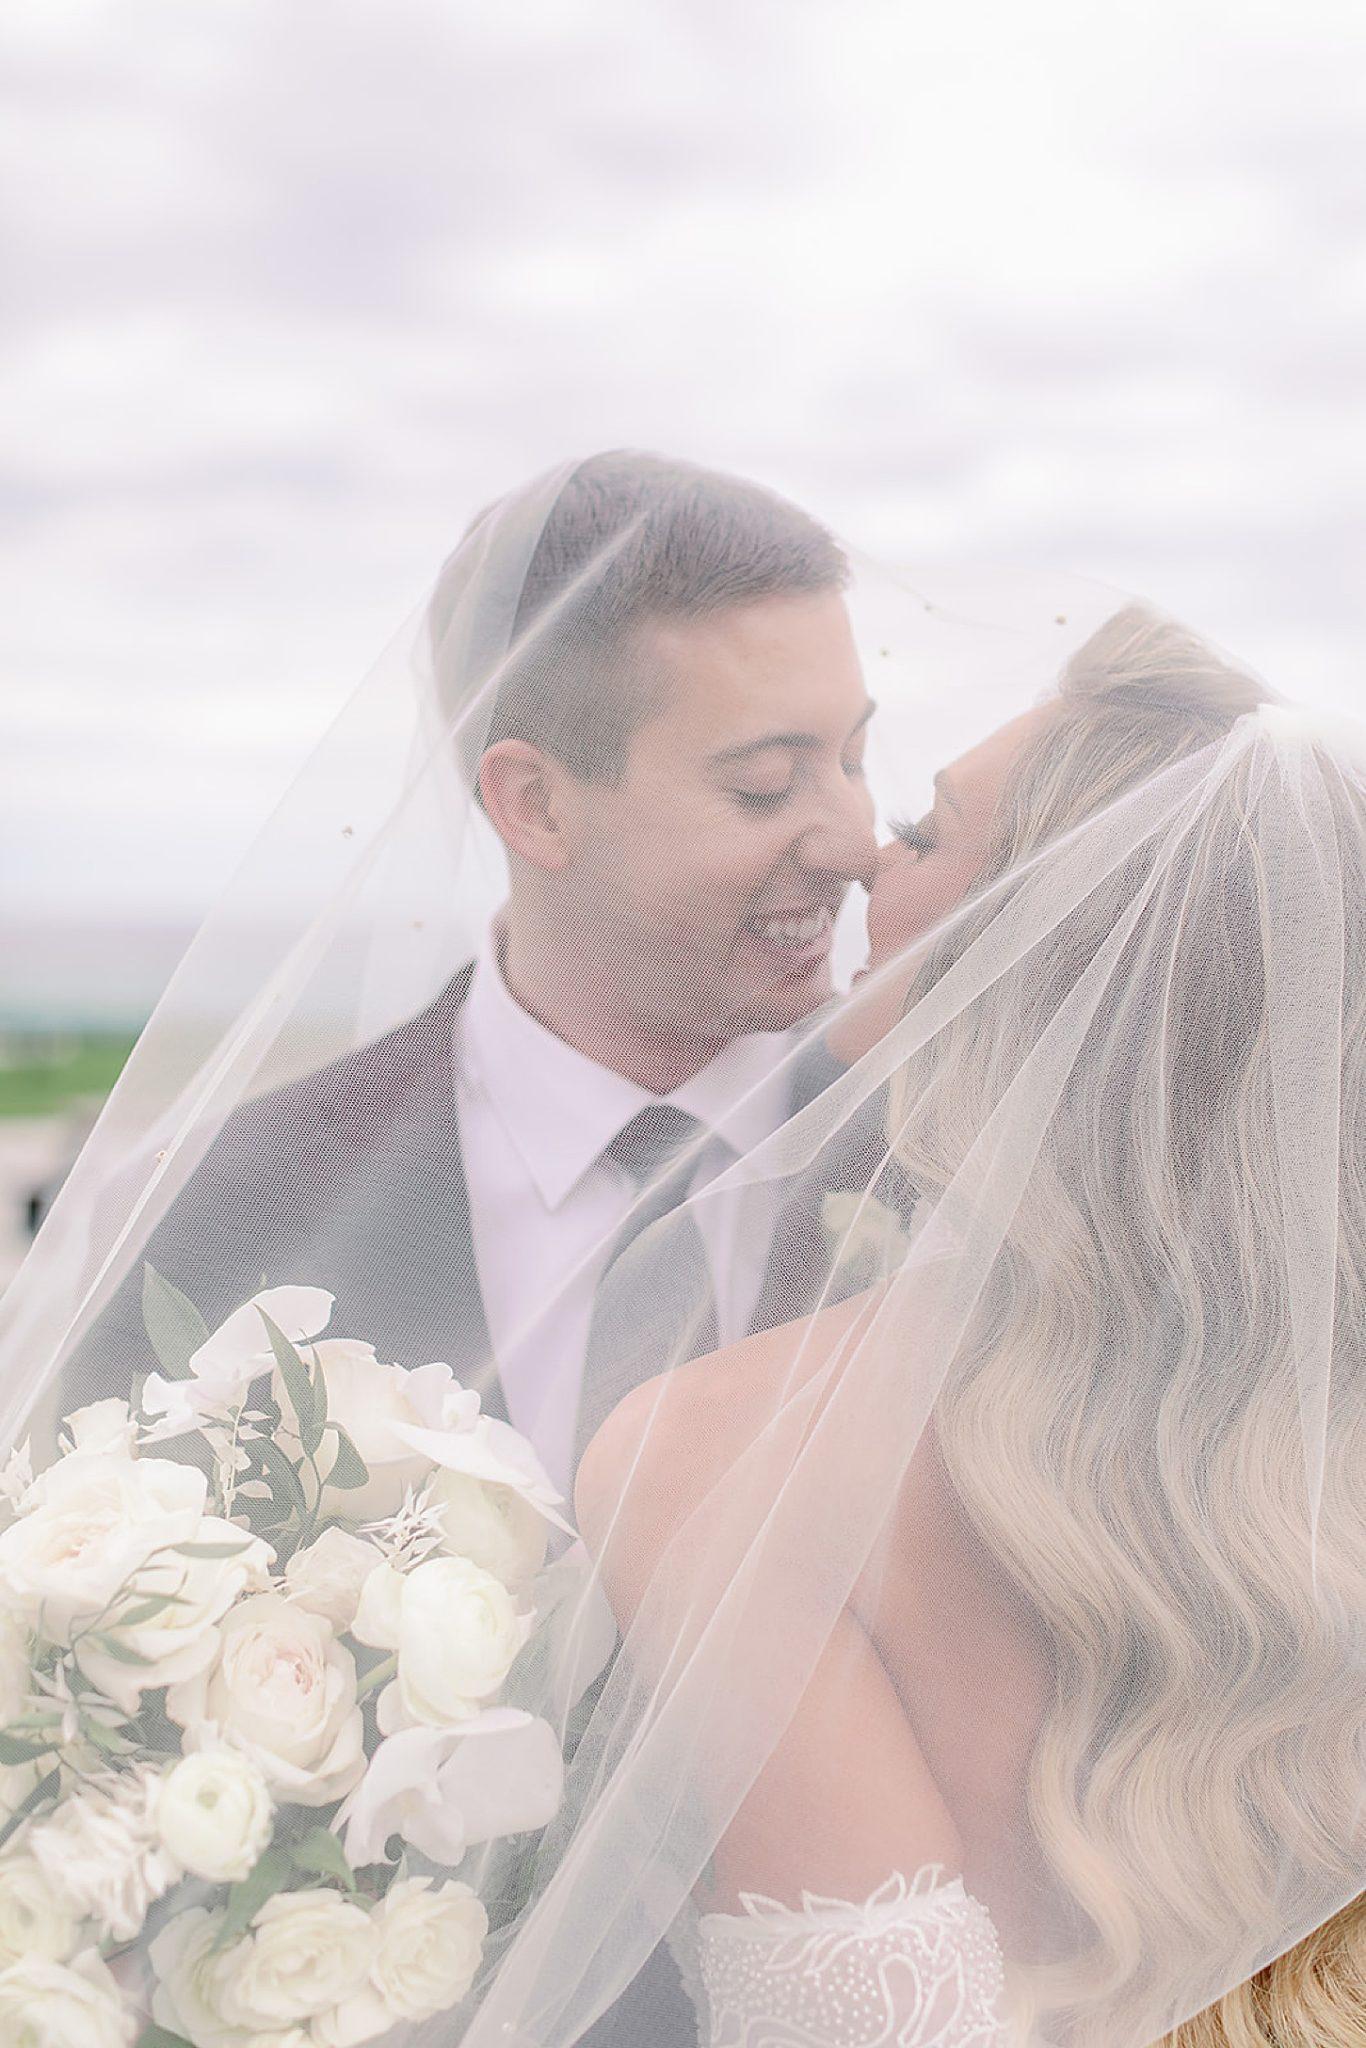 Atlantic City Wedding Photography Studio by Magdalena Studios Lexy Cha 0053 scaled